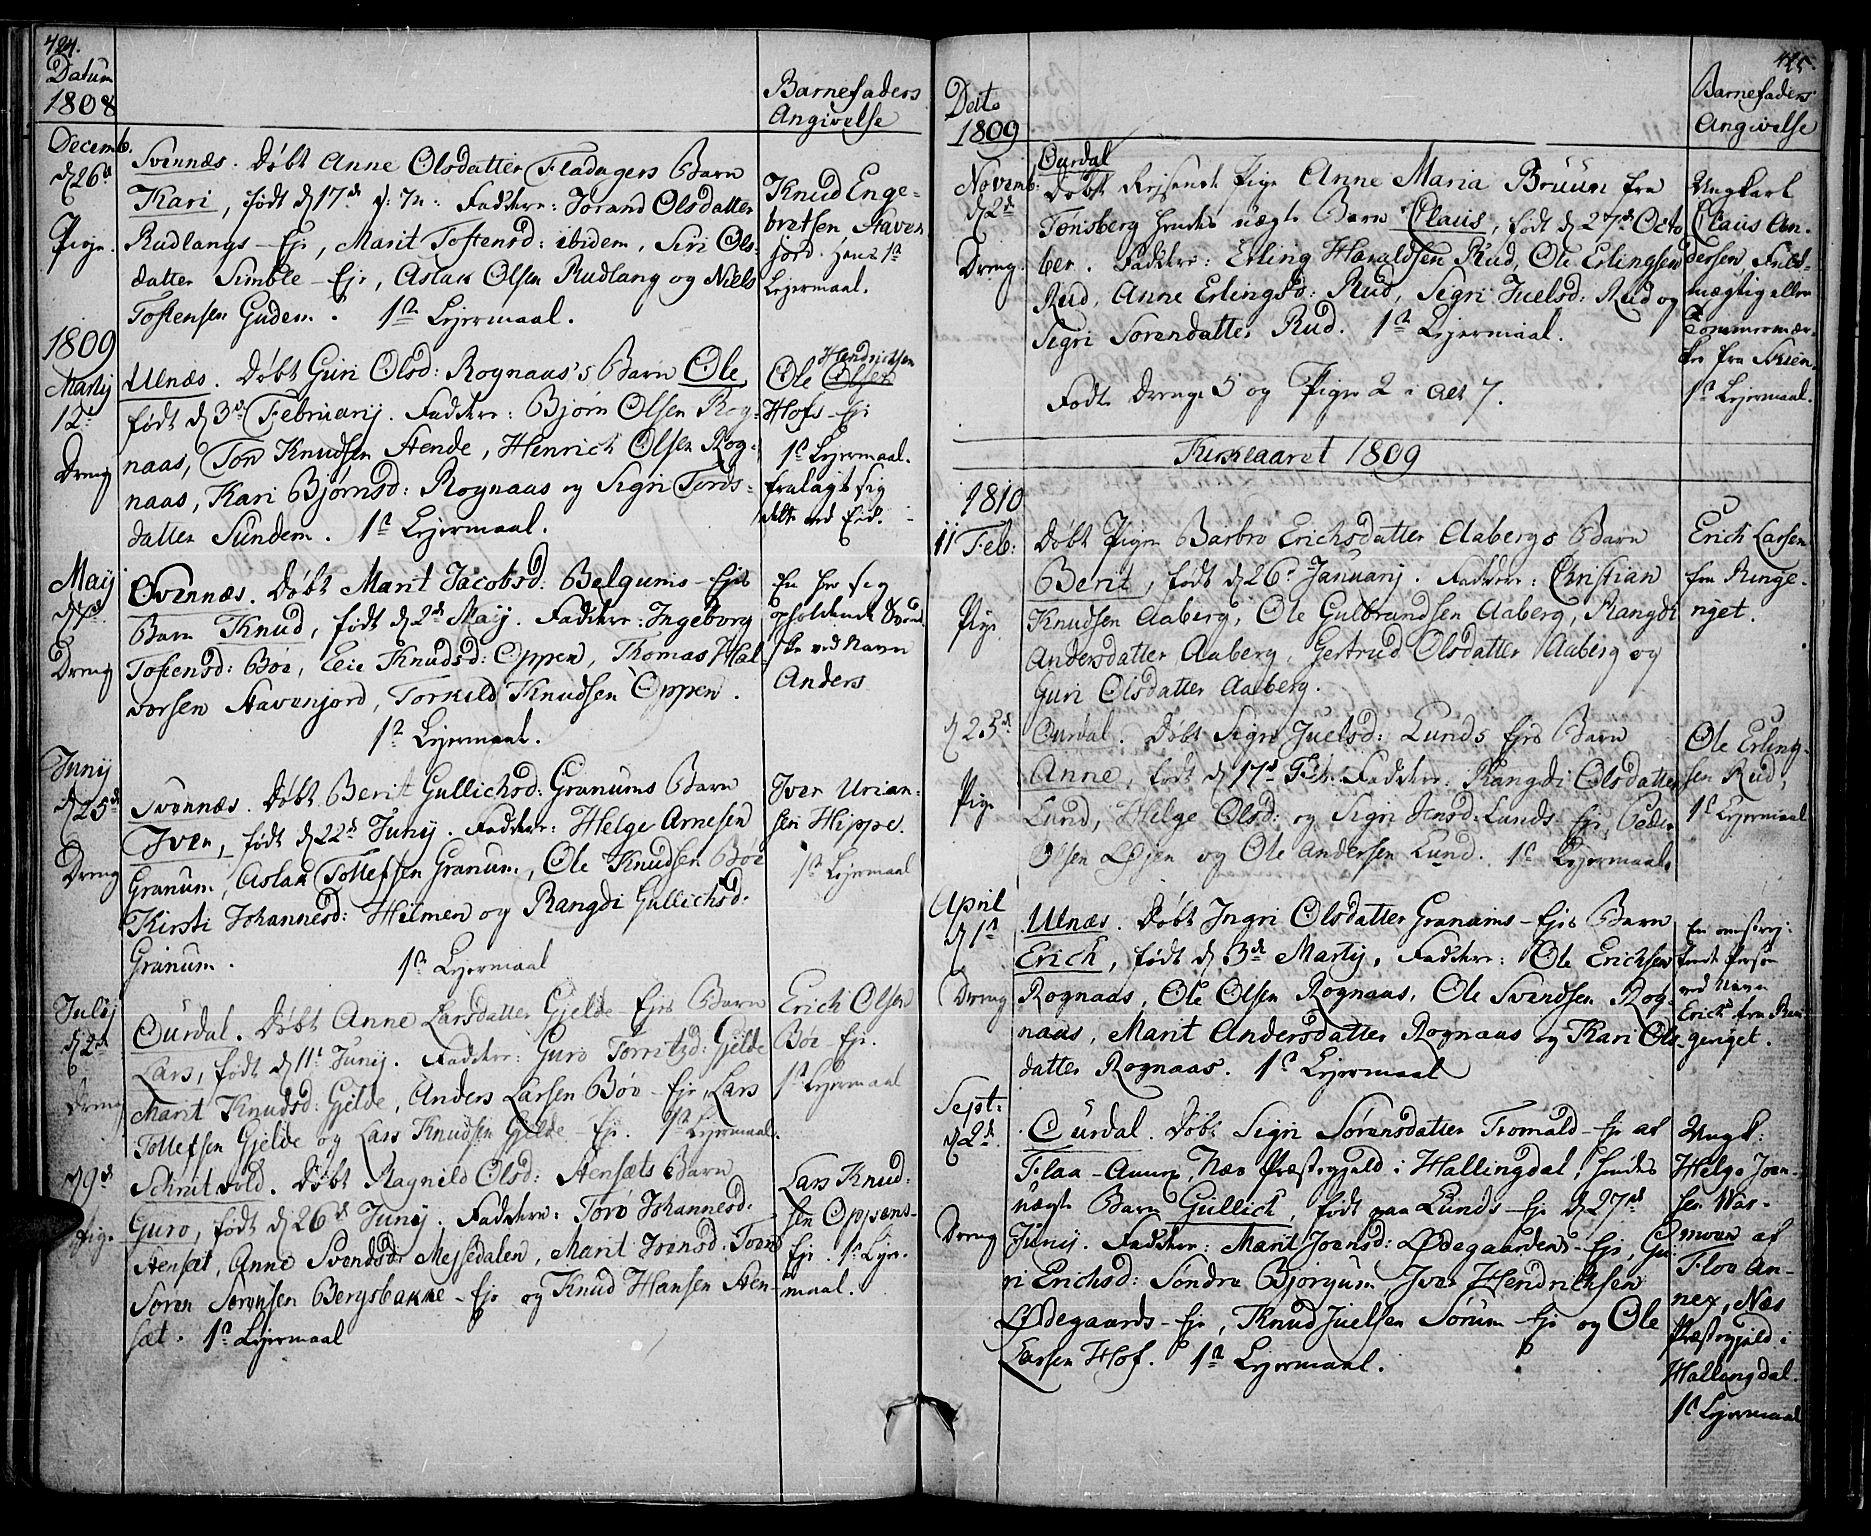 SAH, Nord-Aurdal prestekontor, Ministerialbok nr. 1, 1808-1815, s. 424-425